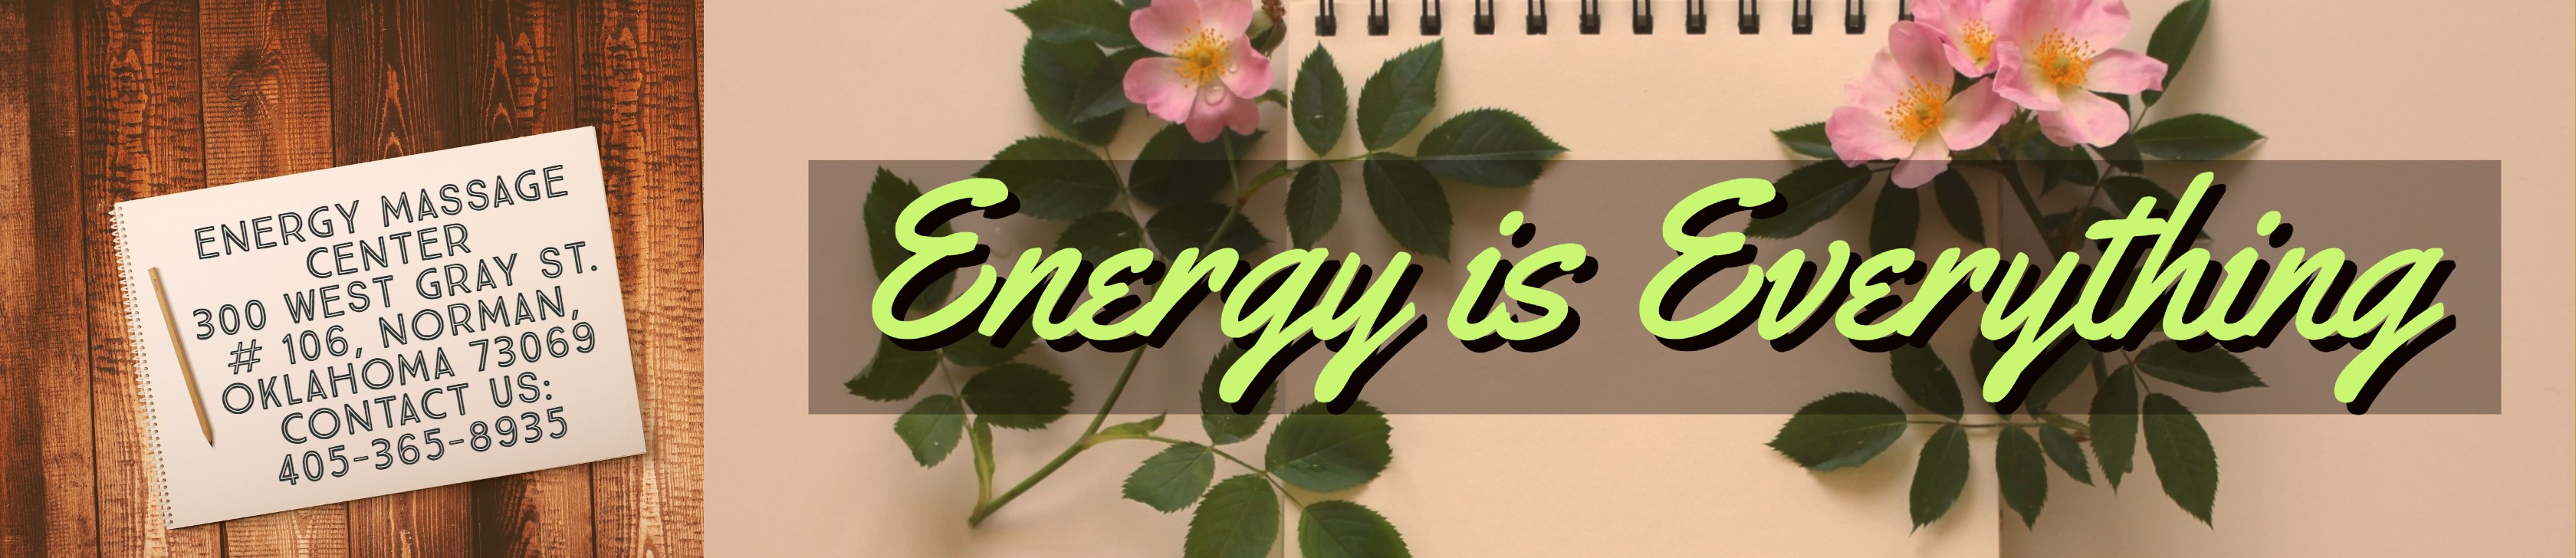 Energy Massage Center